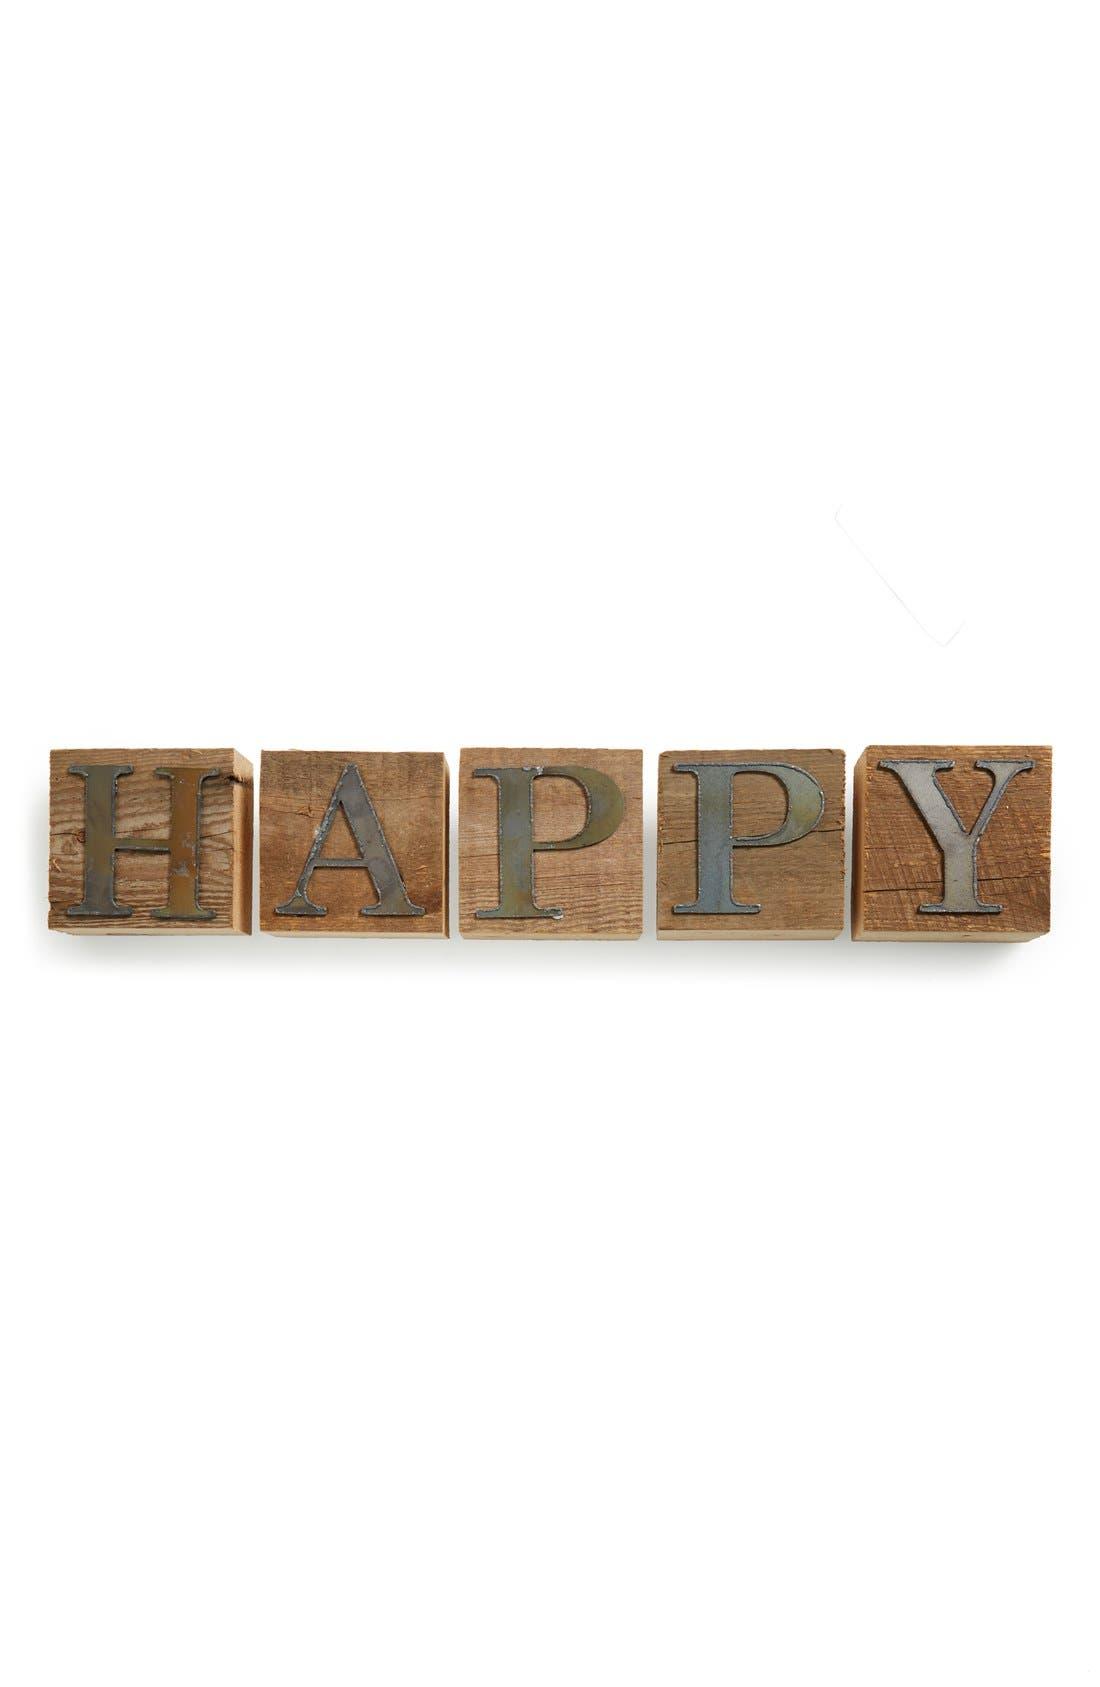 Main Image - Second Nature by Hand 'Happy' Repurposed Wood Block Art